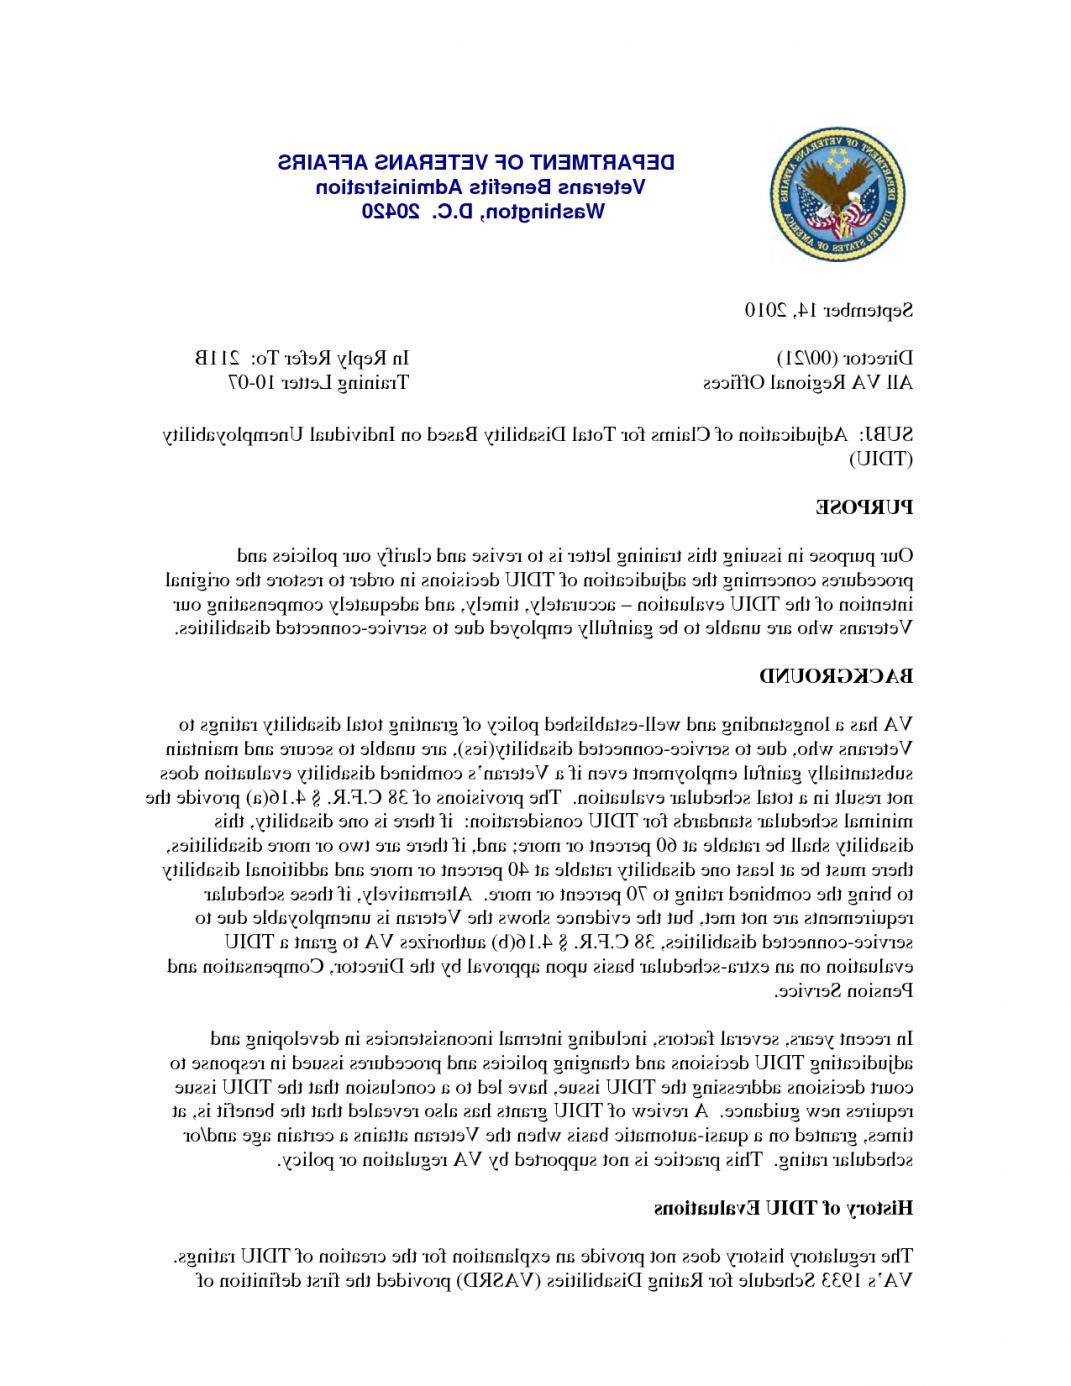 Wedding Invitation Letter Template - Cover Letter for Wedding Invitation Email Unique Non Profit Cover